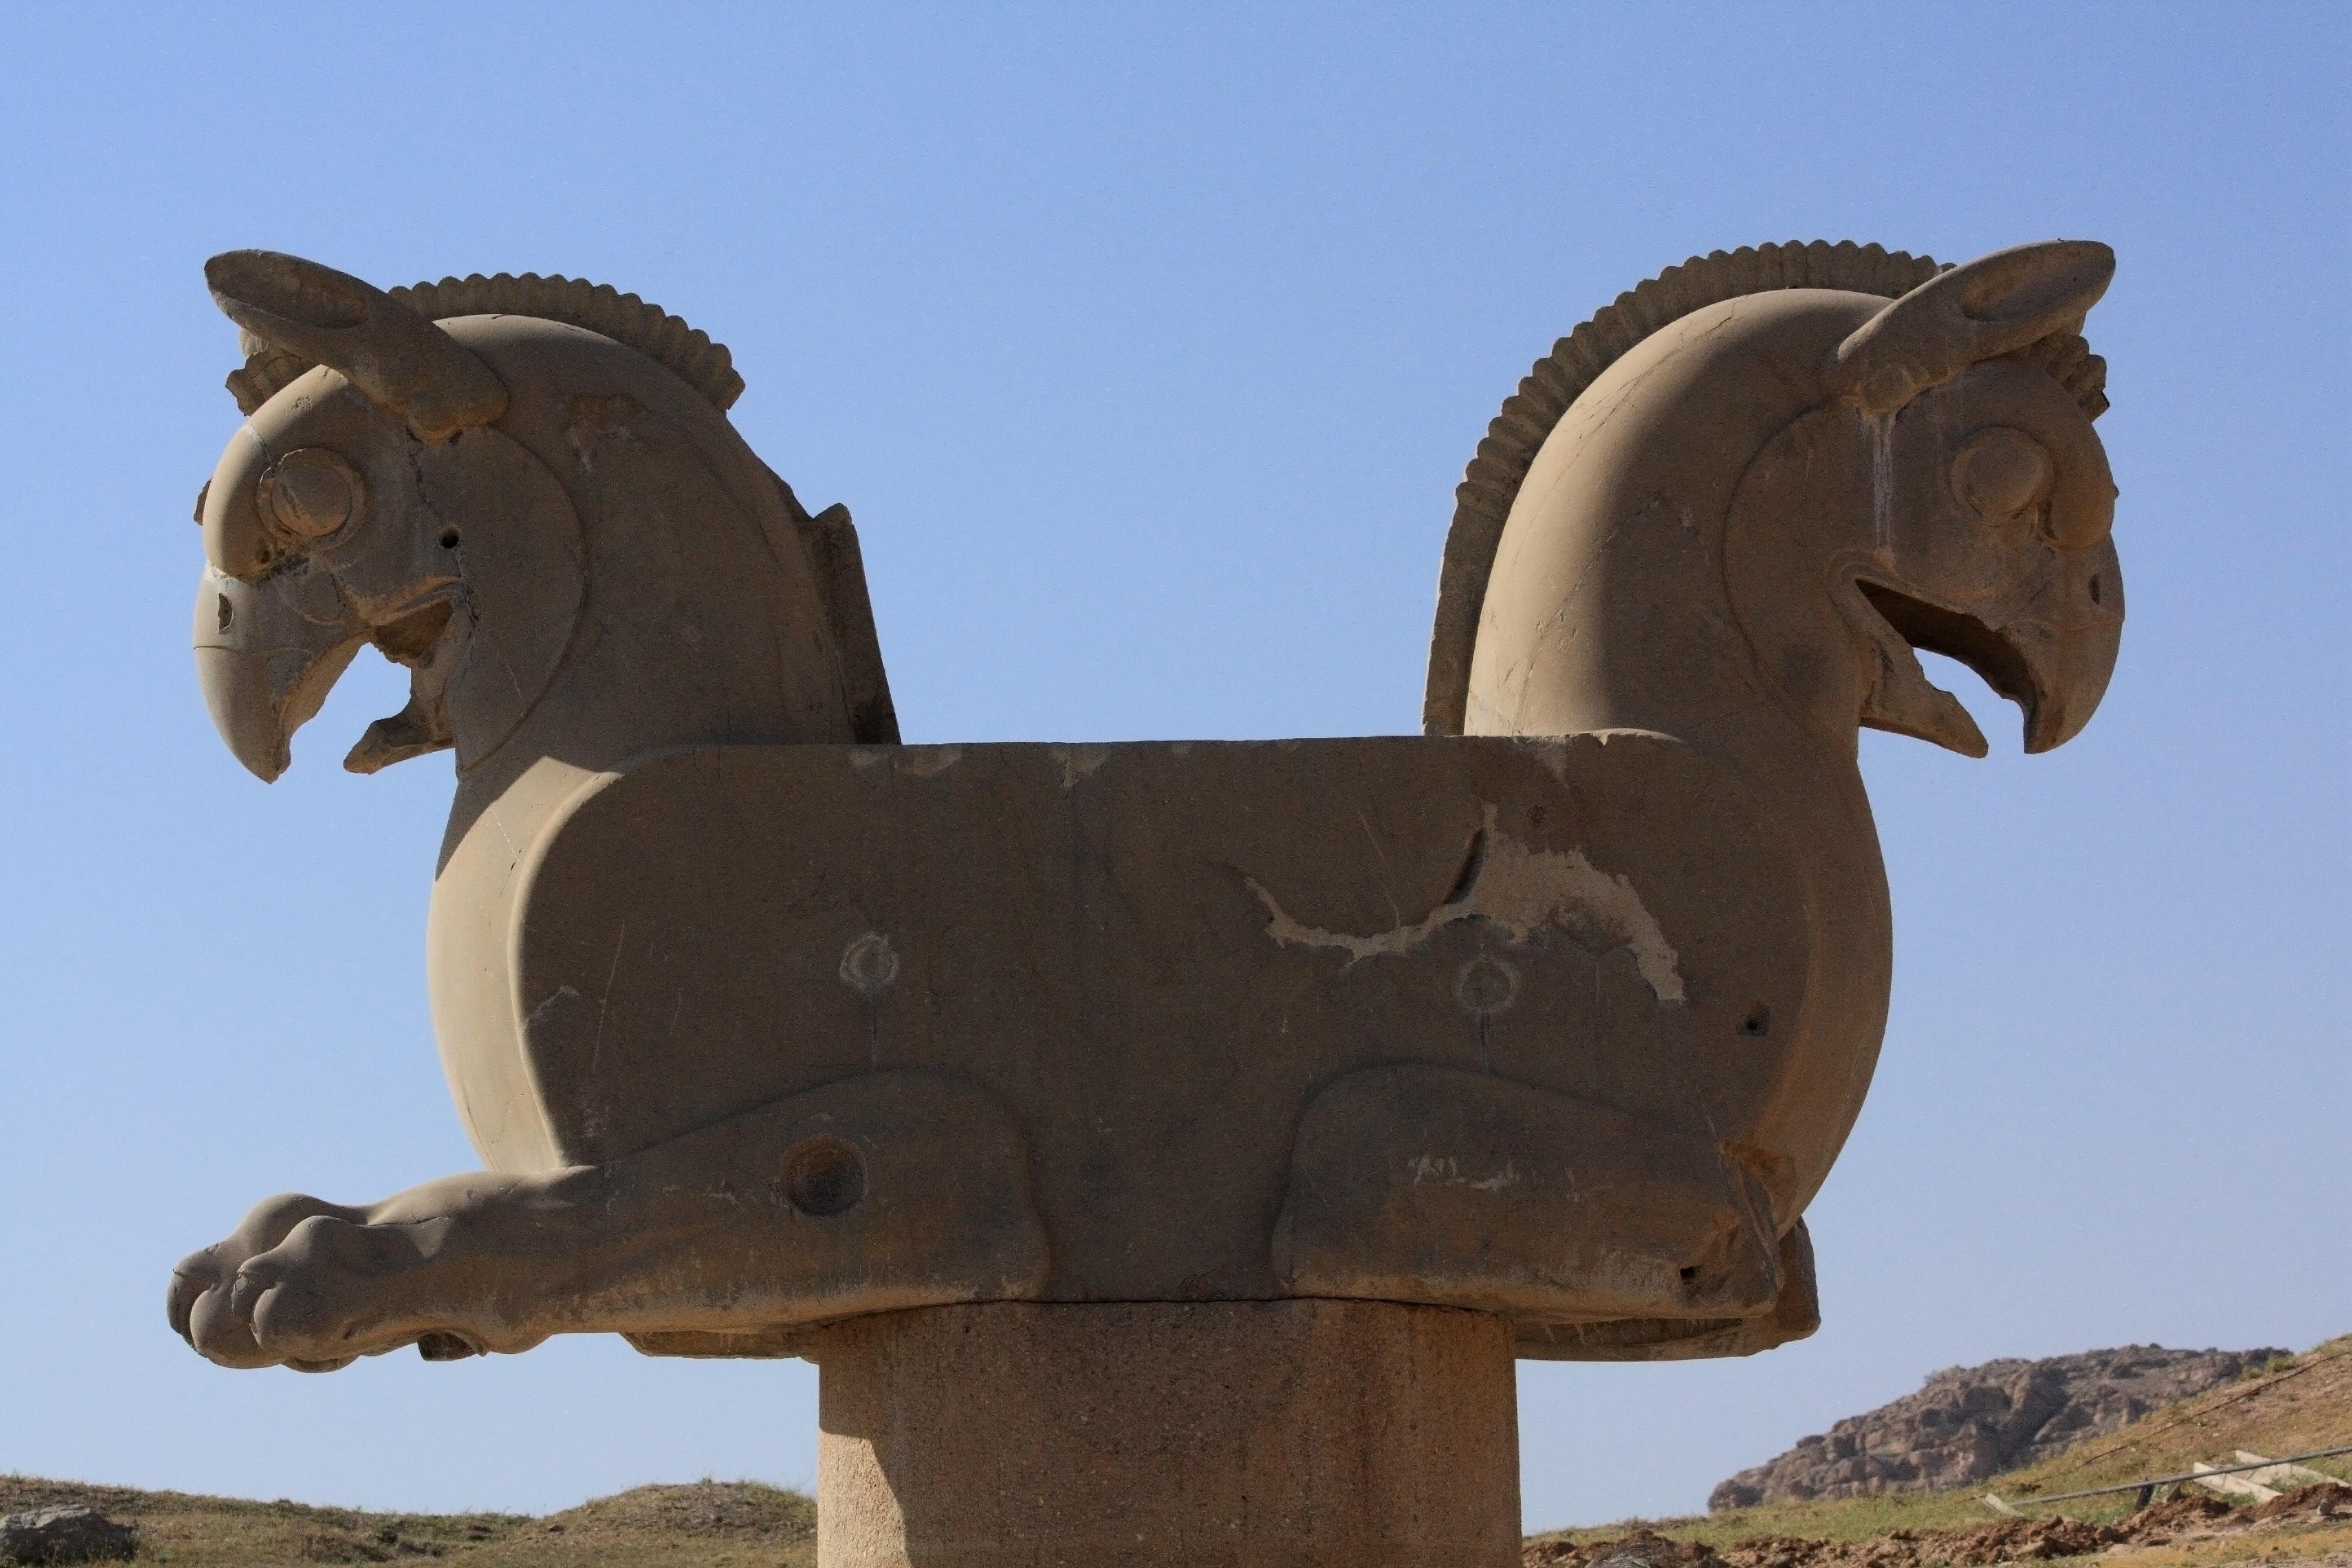 Free Images Sand Dog Sandstone Monument Statue Lion Gargoyle Sculpture Art Carving Iran Persepolis Ancient History 4272x2848 709291 Free Stock Photos Pxhere